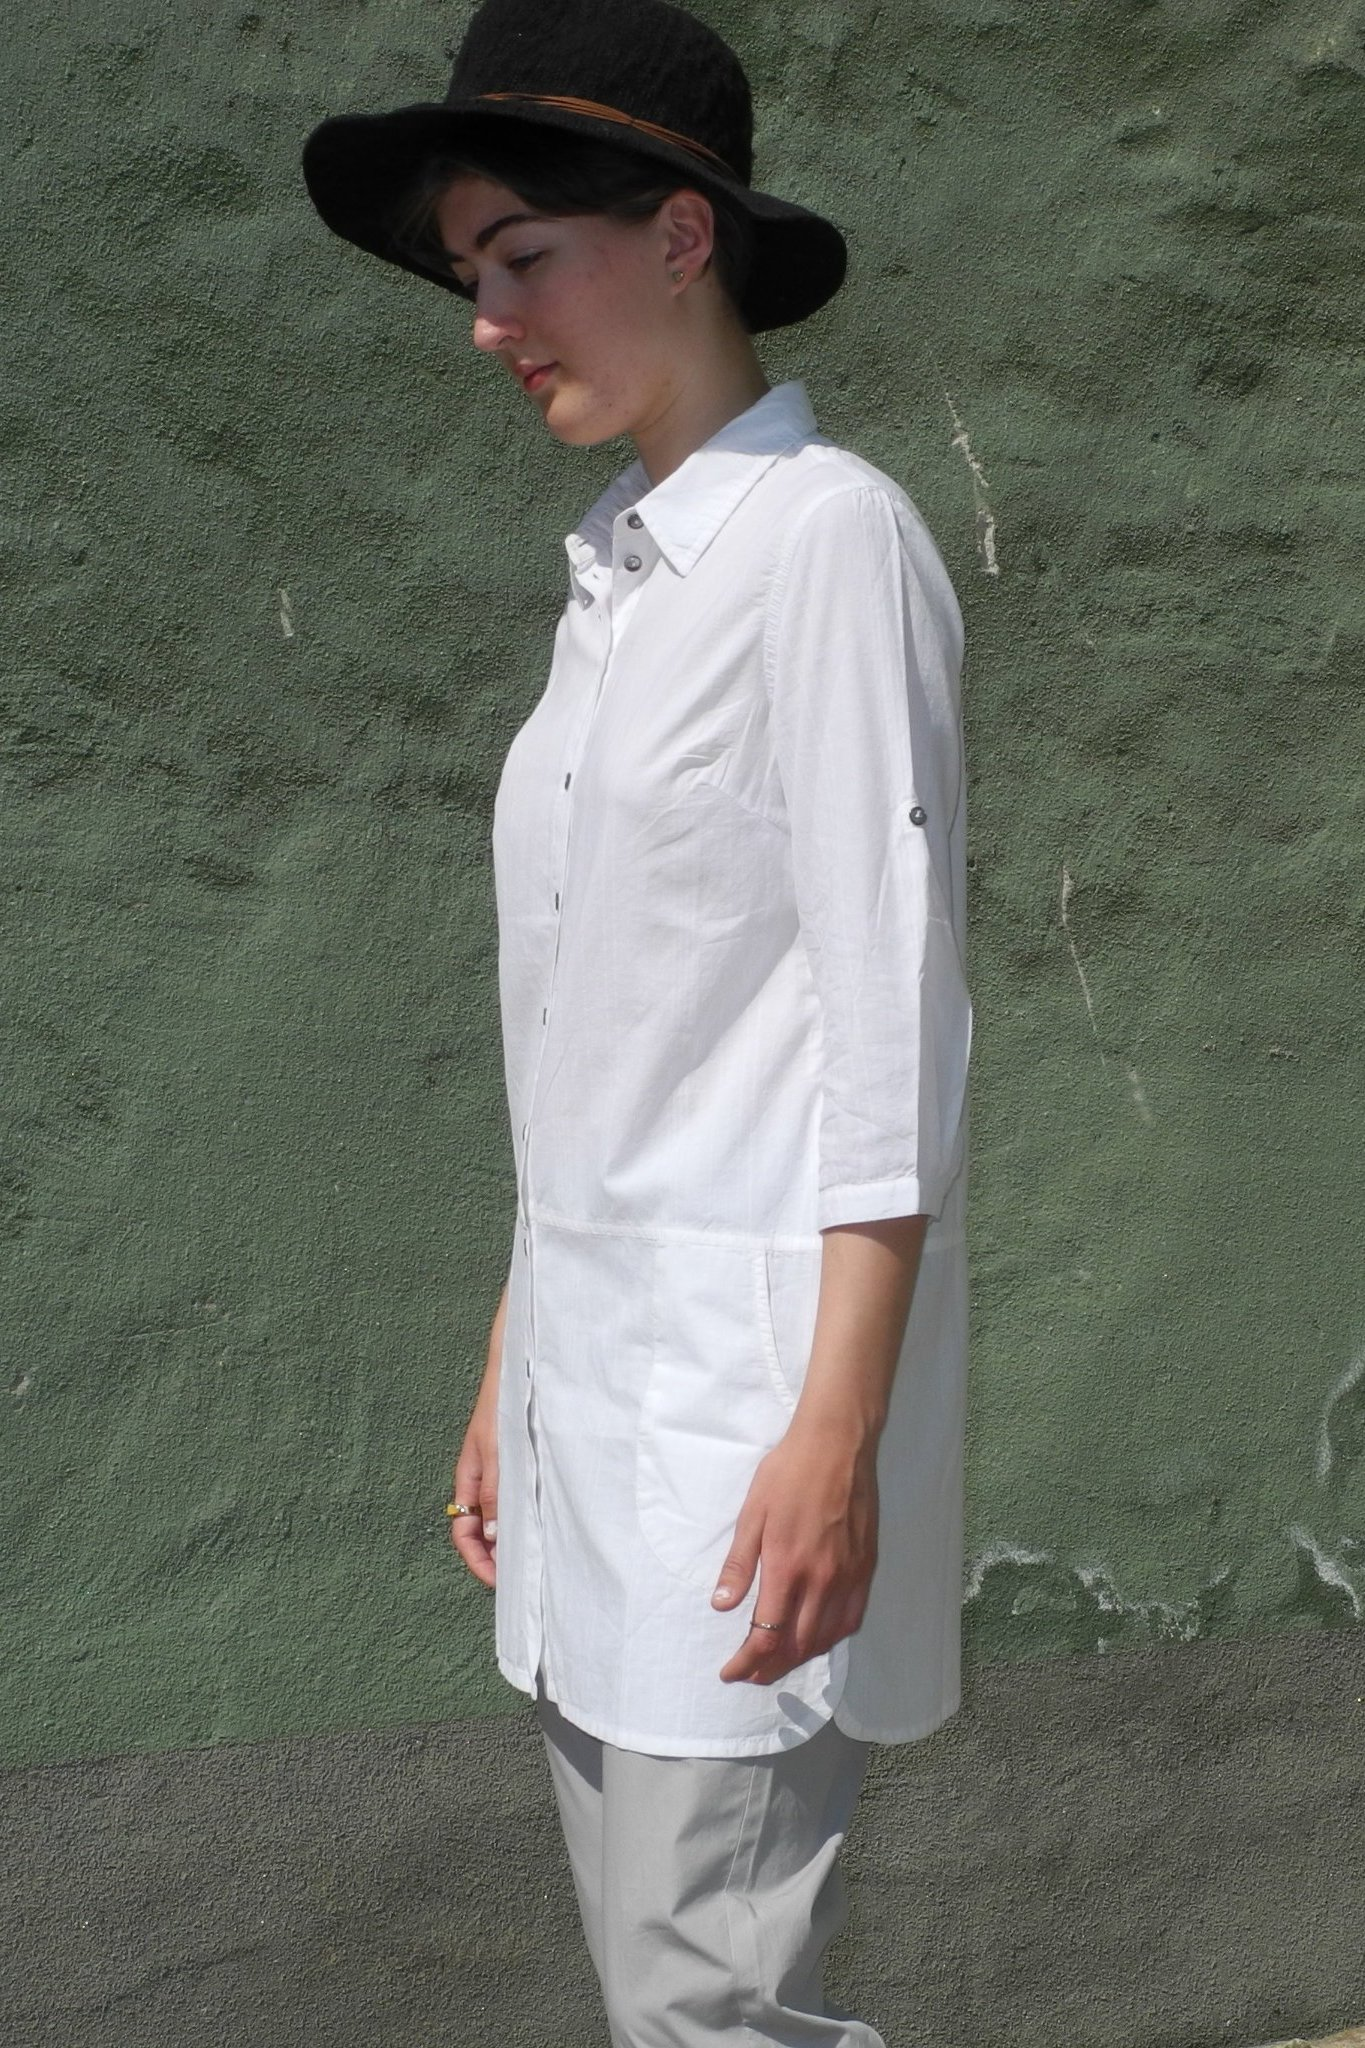 bb66ed563f13 Lång skjorta/Tunika trekvartsärm vit